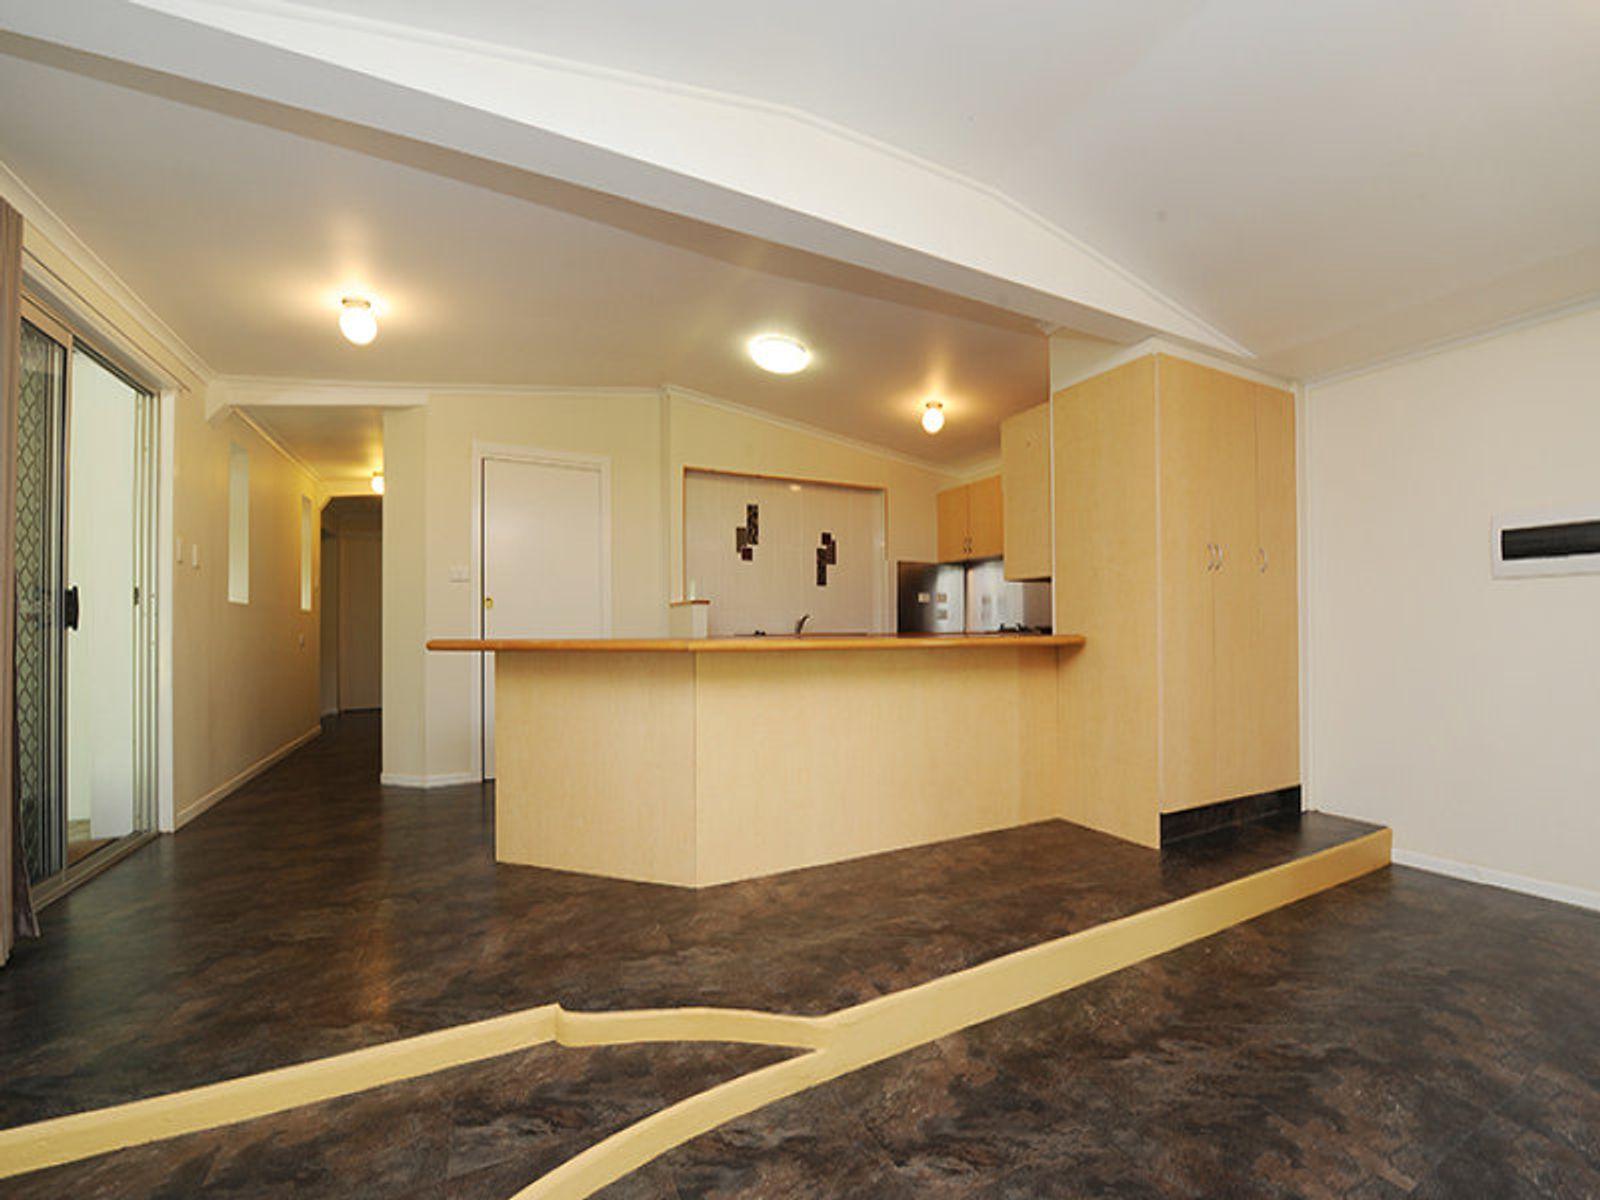 70 Baker Finch Avenue, Peachester, QLD 4519